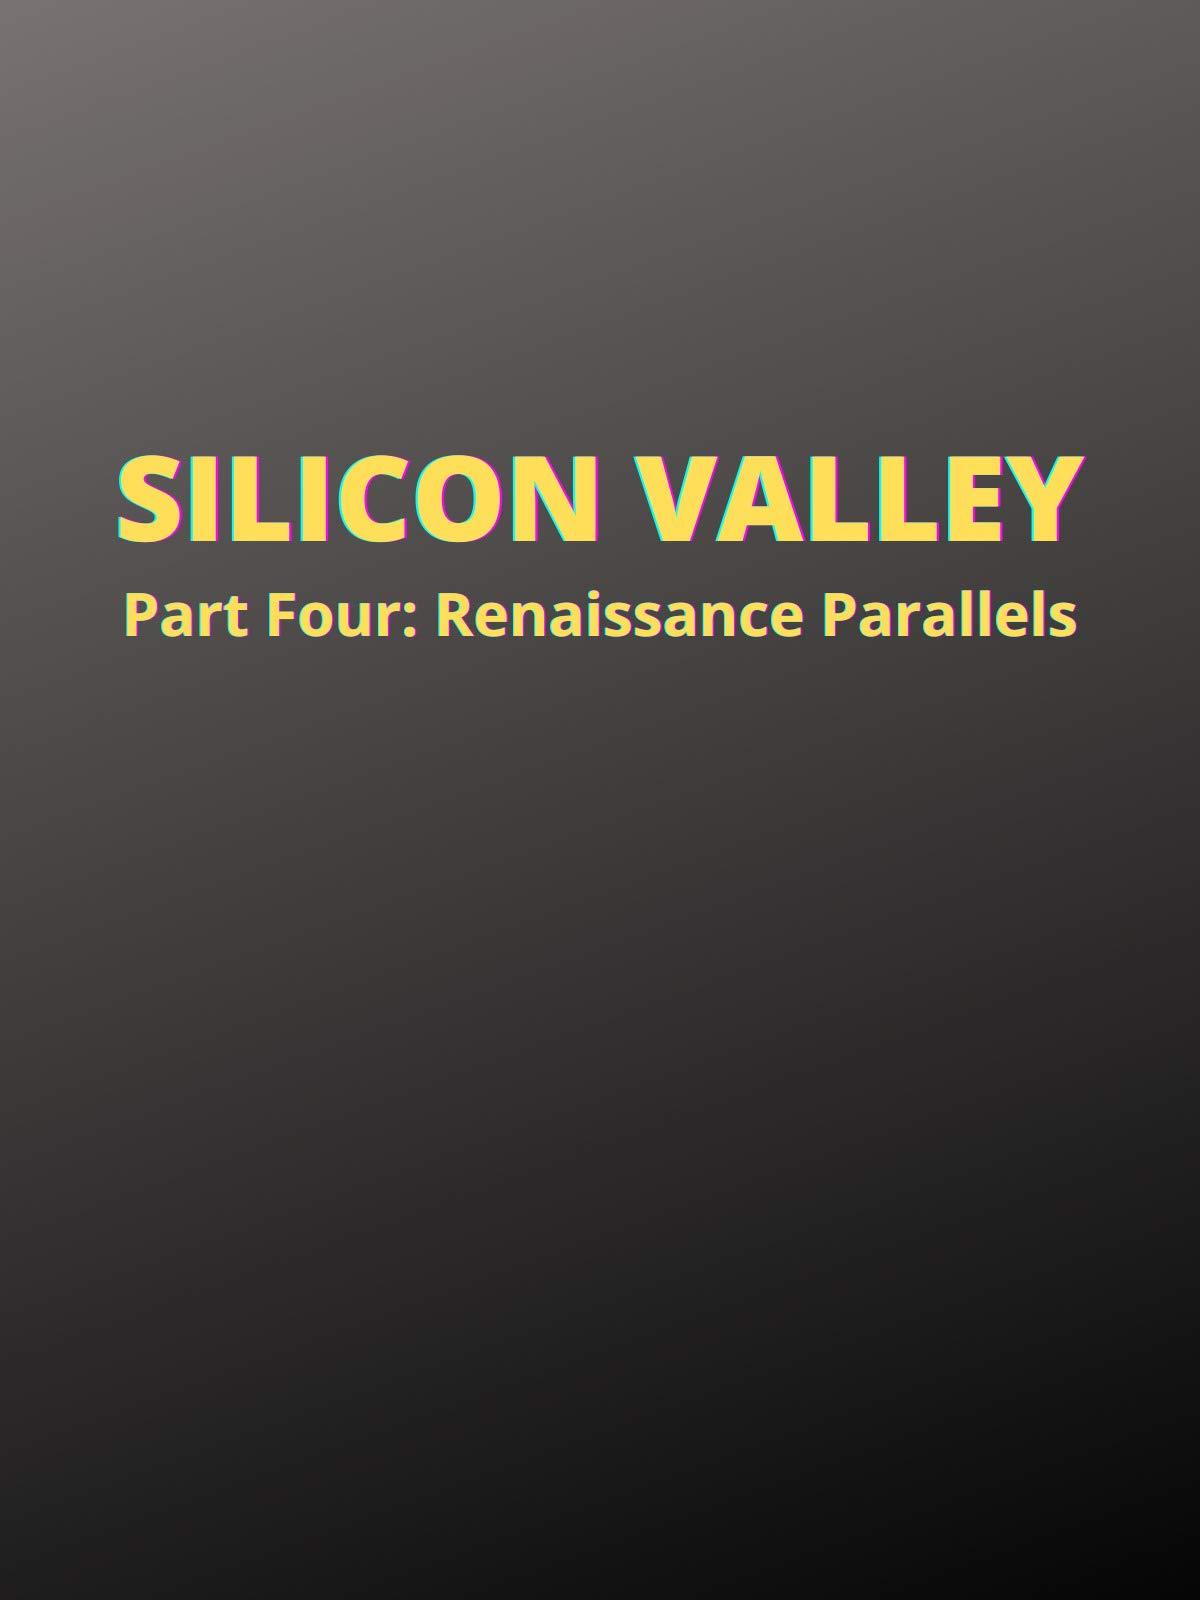 Silicon Valley: Part Four, Renaissance Parallels on Amazon Prime Video UK